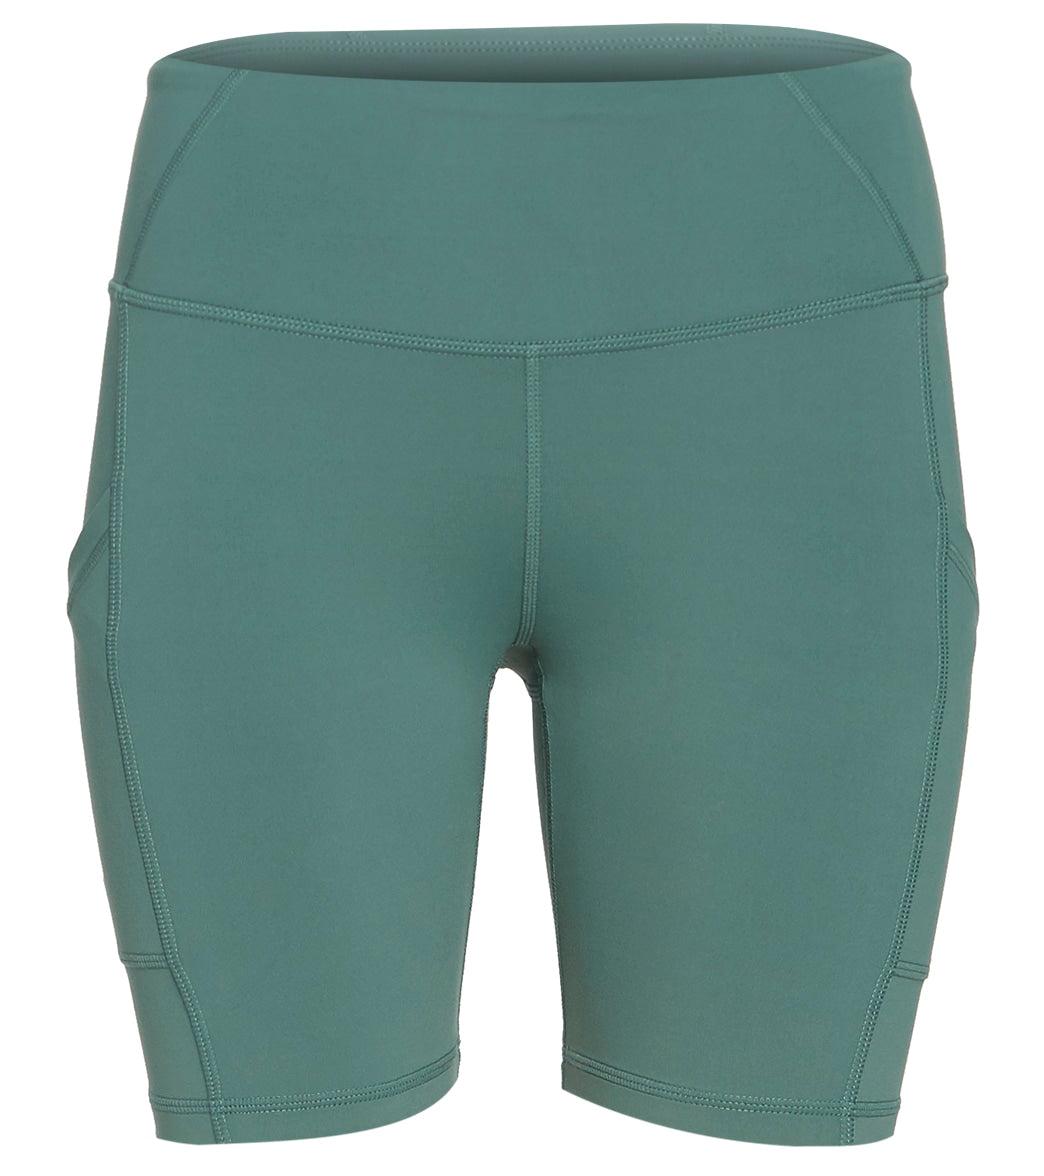 prAna Women's Electa Yoga Shorts - Peacock Large Cotton